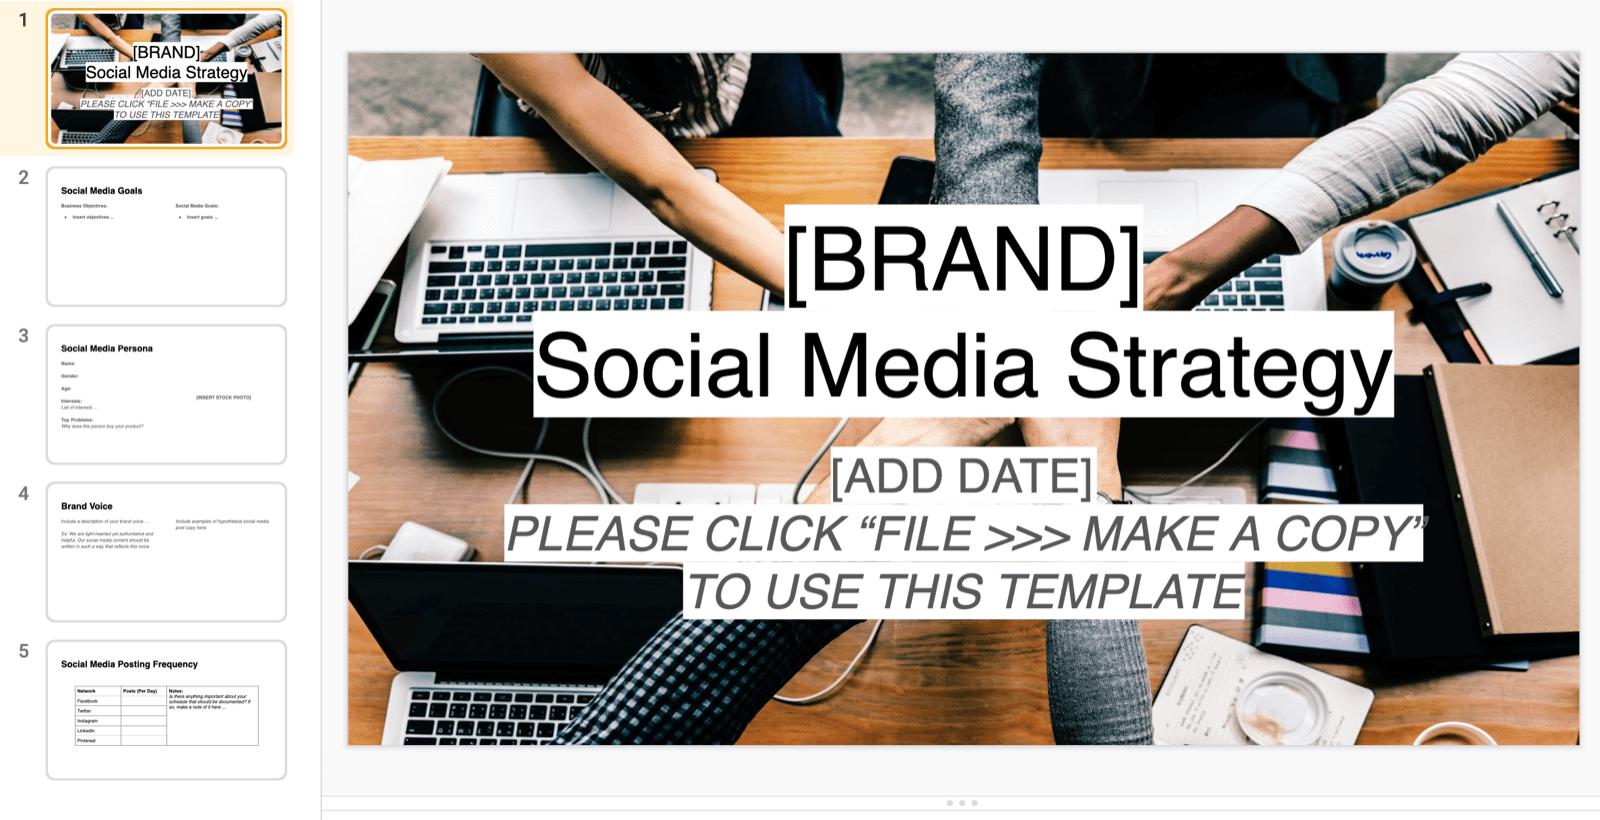 How To Create A Social Media Marketing Plan The Consultant Cheat Sheet Social Media Examiner